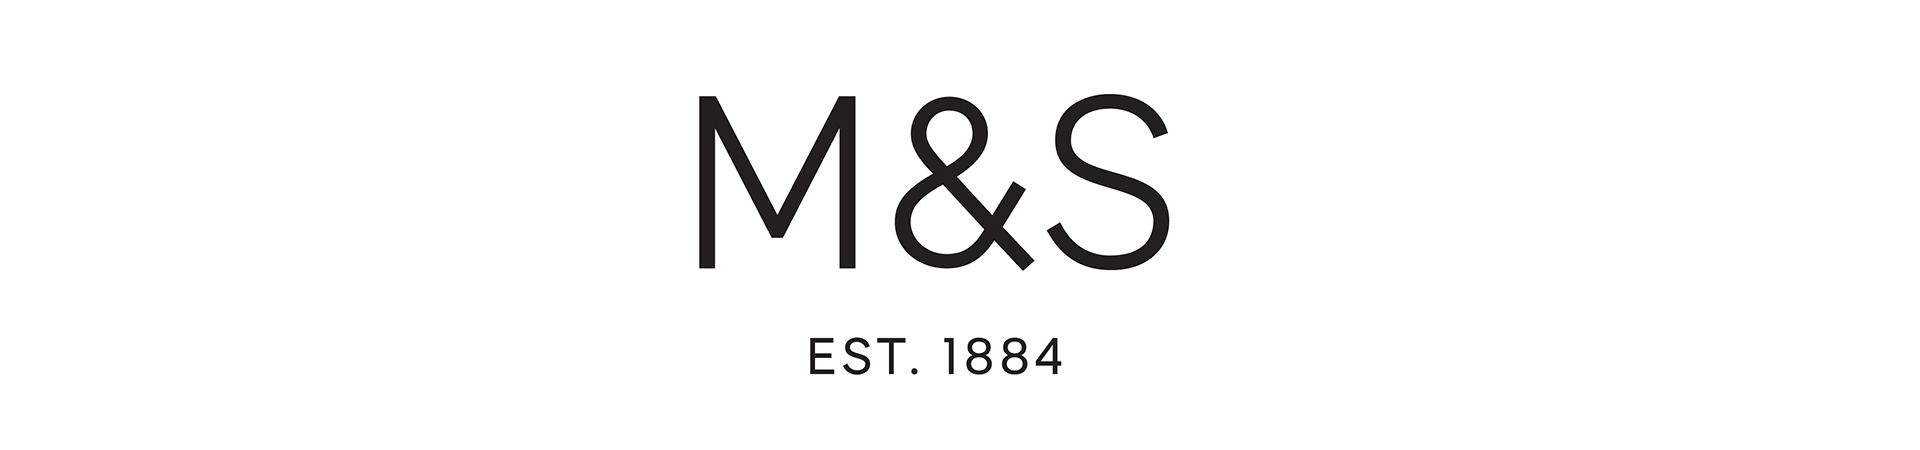 M&S Gift Cards via L2S